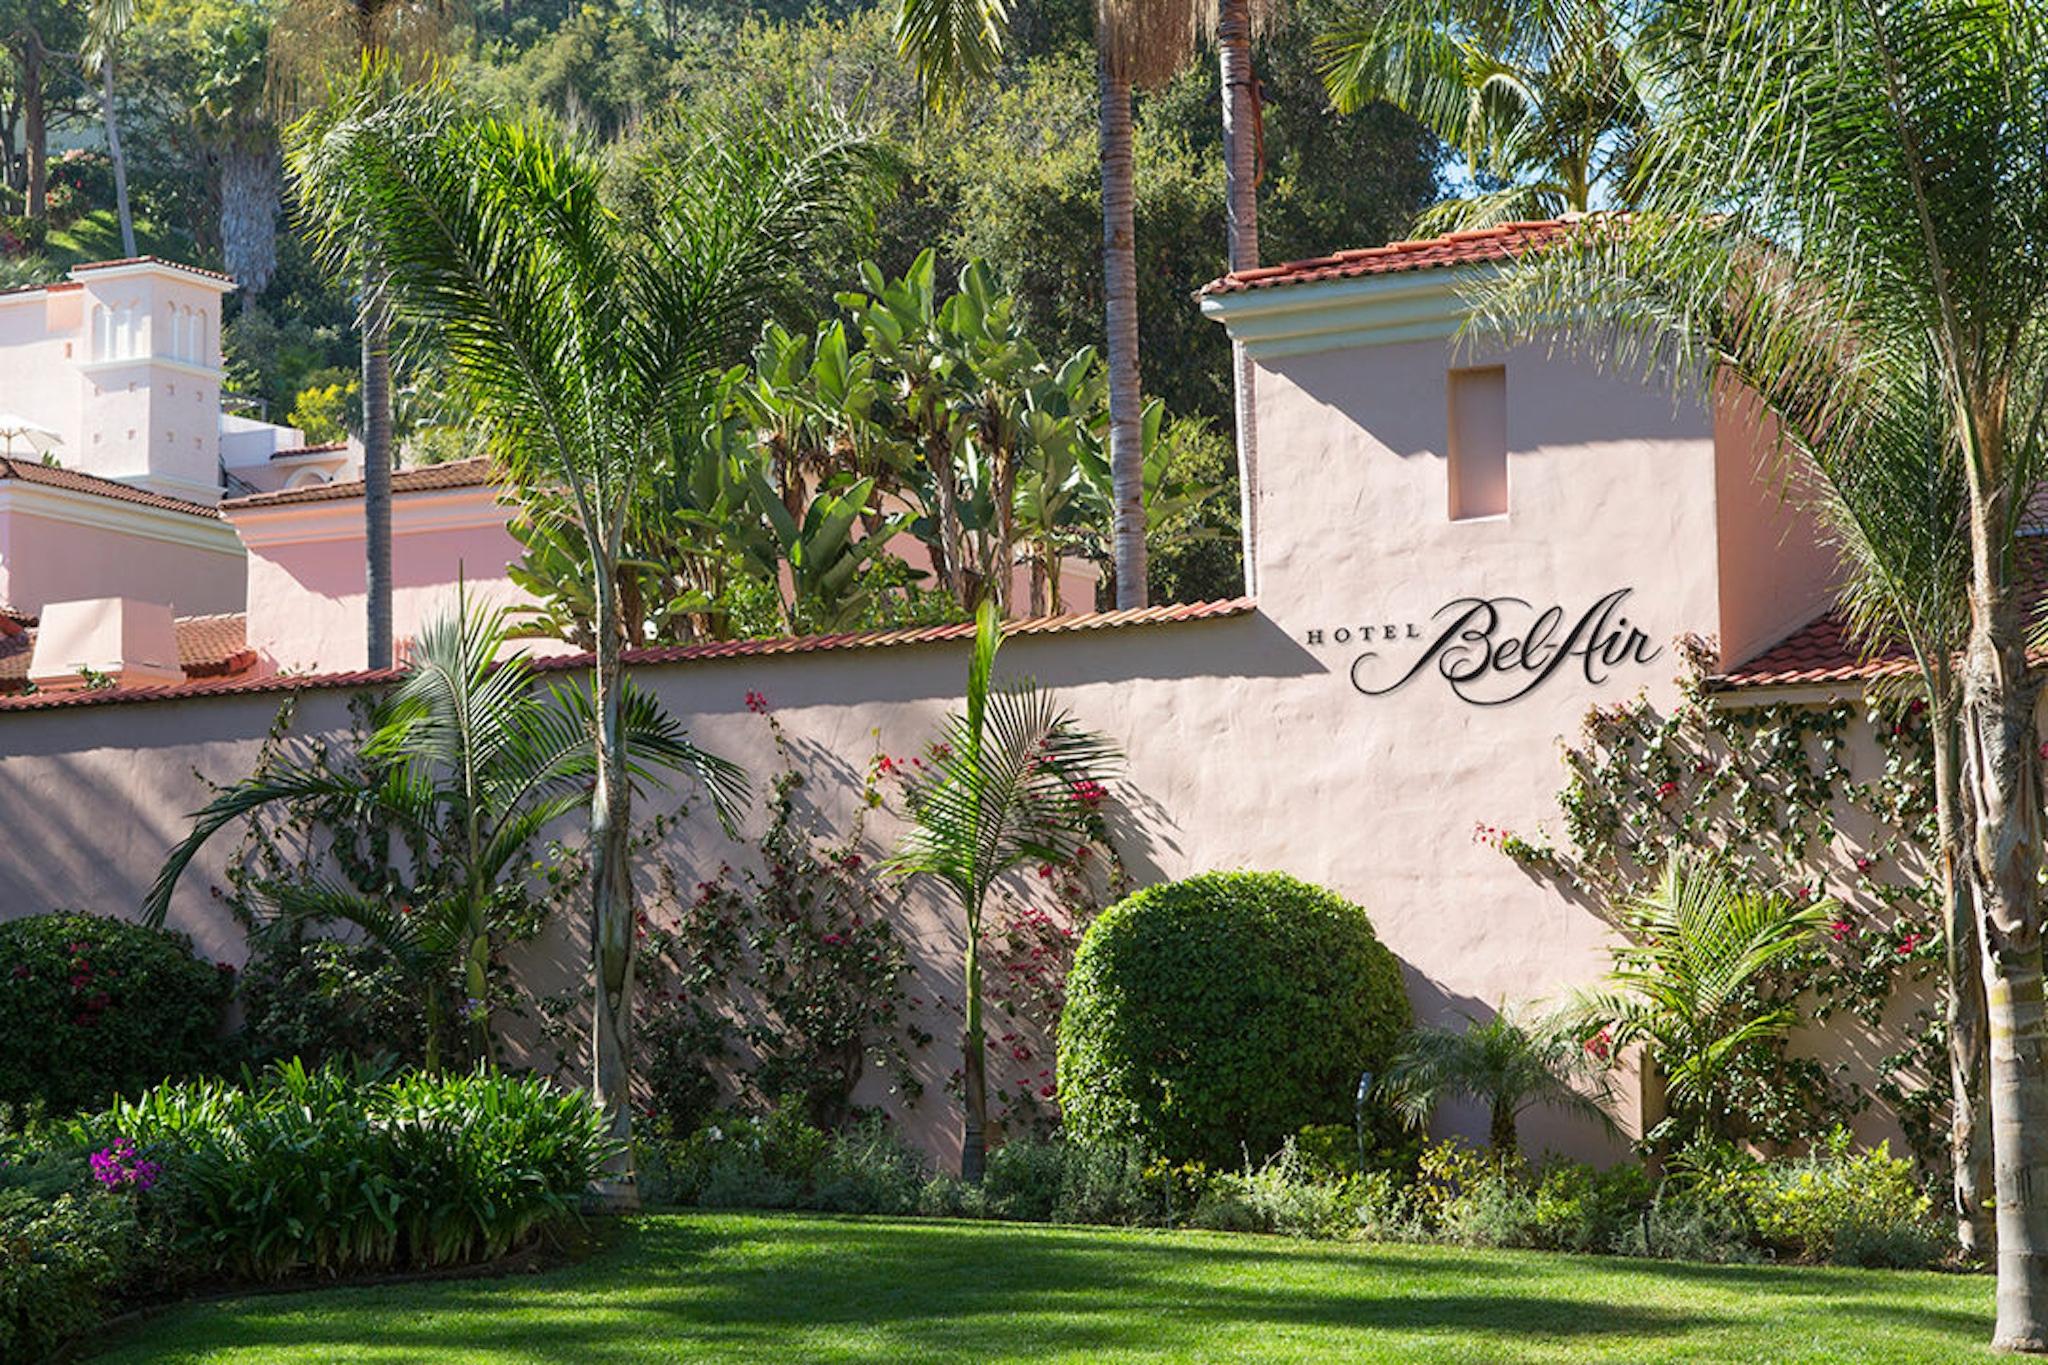 Historic Los Angeles Hotels - Hotel Bel-Air